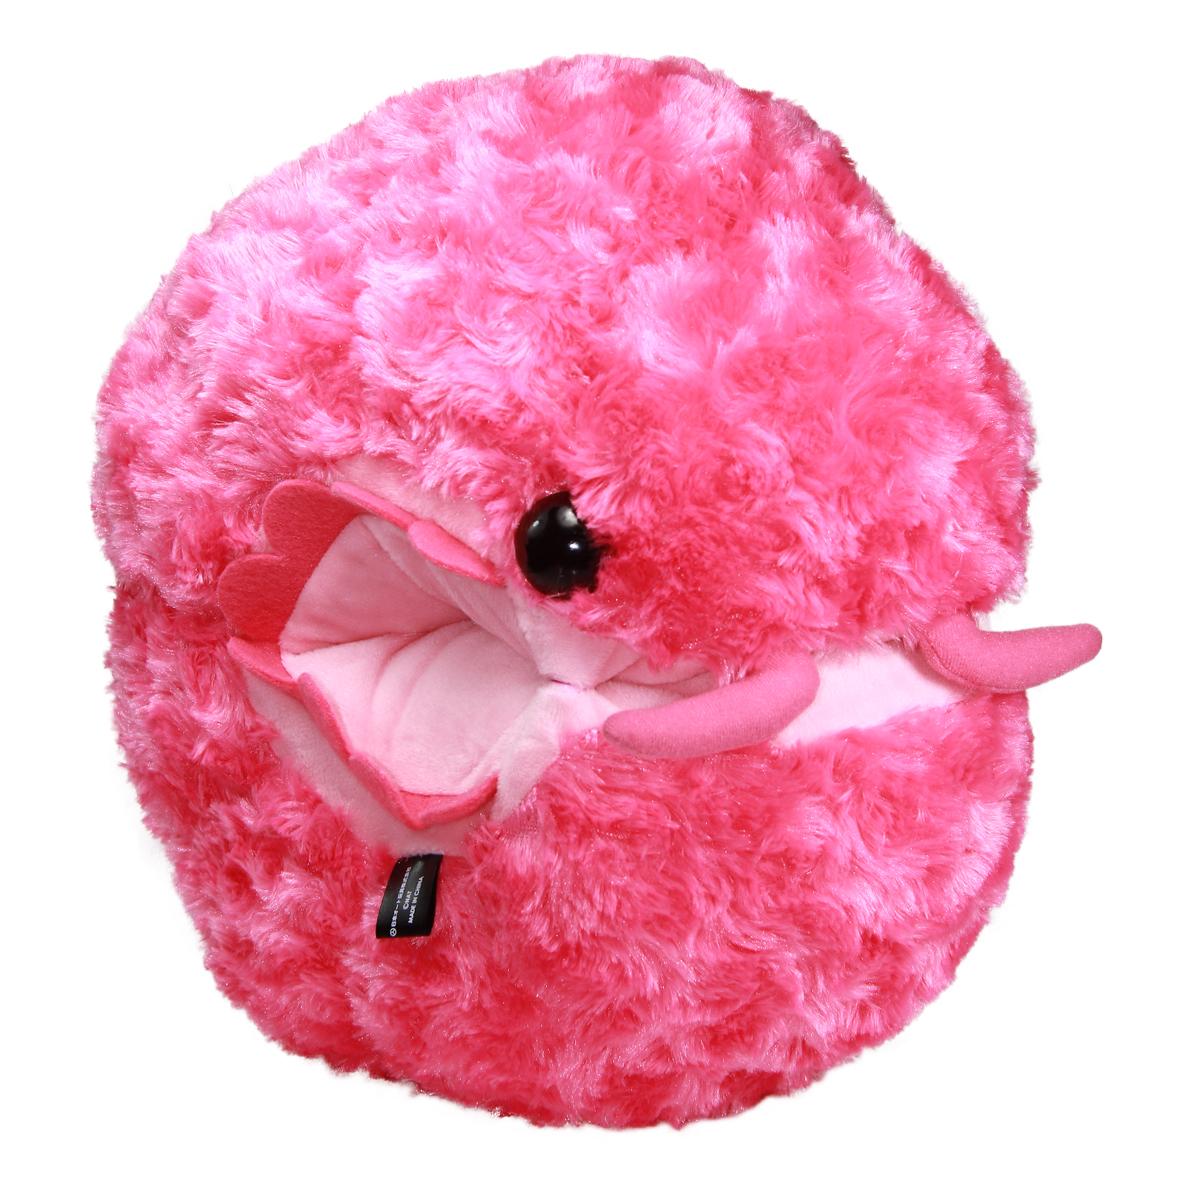 Dangomushi Super Soft Larva Roly Poly Plush Toy Pink Size 13 Inches